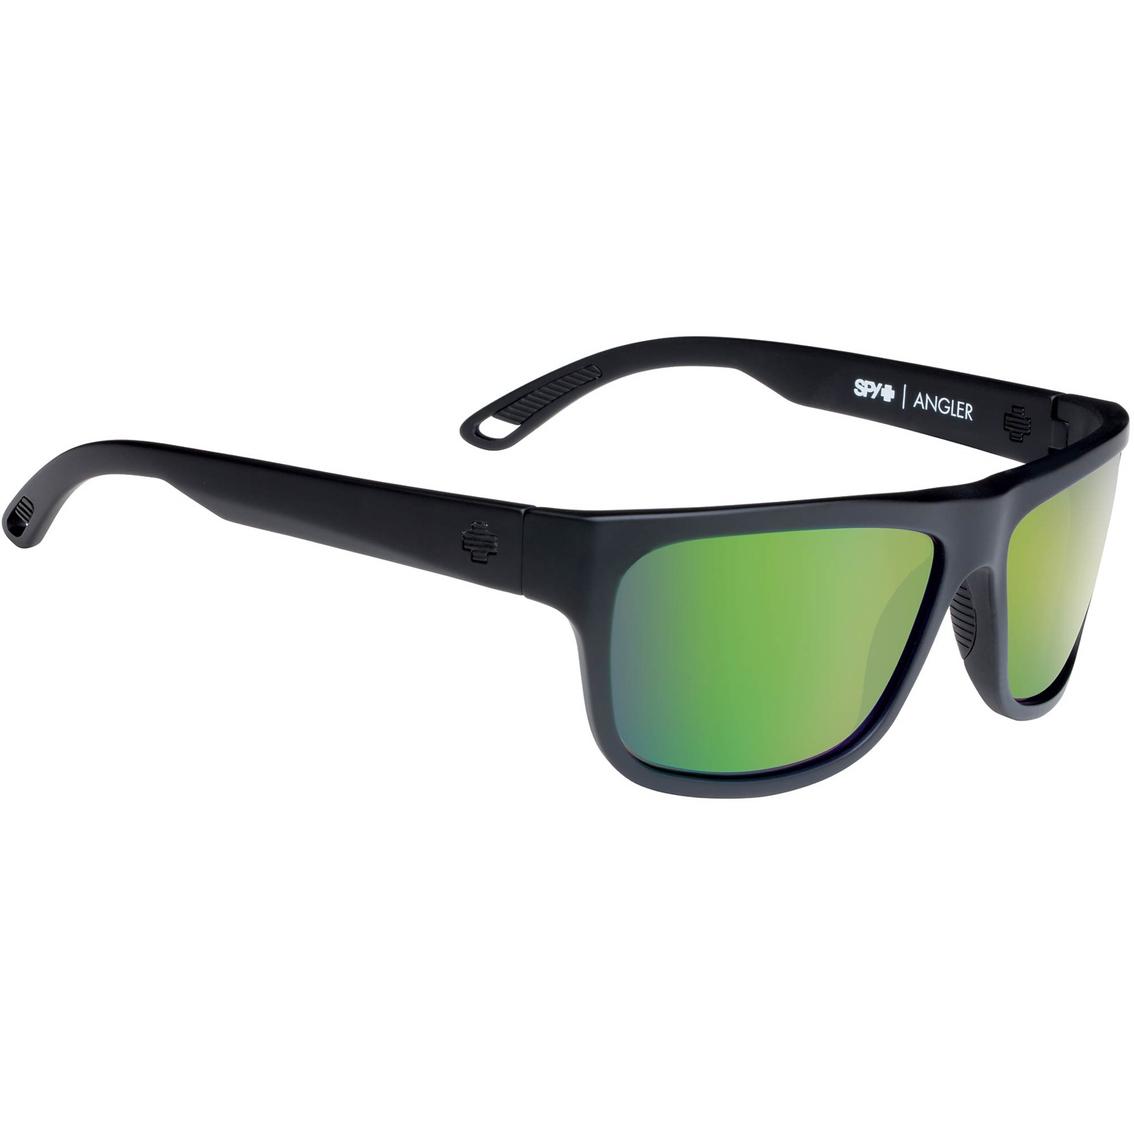 b4afb1b8ff060 Spy Optic Angler Polarized Sunglasses